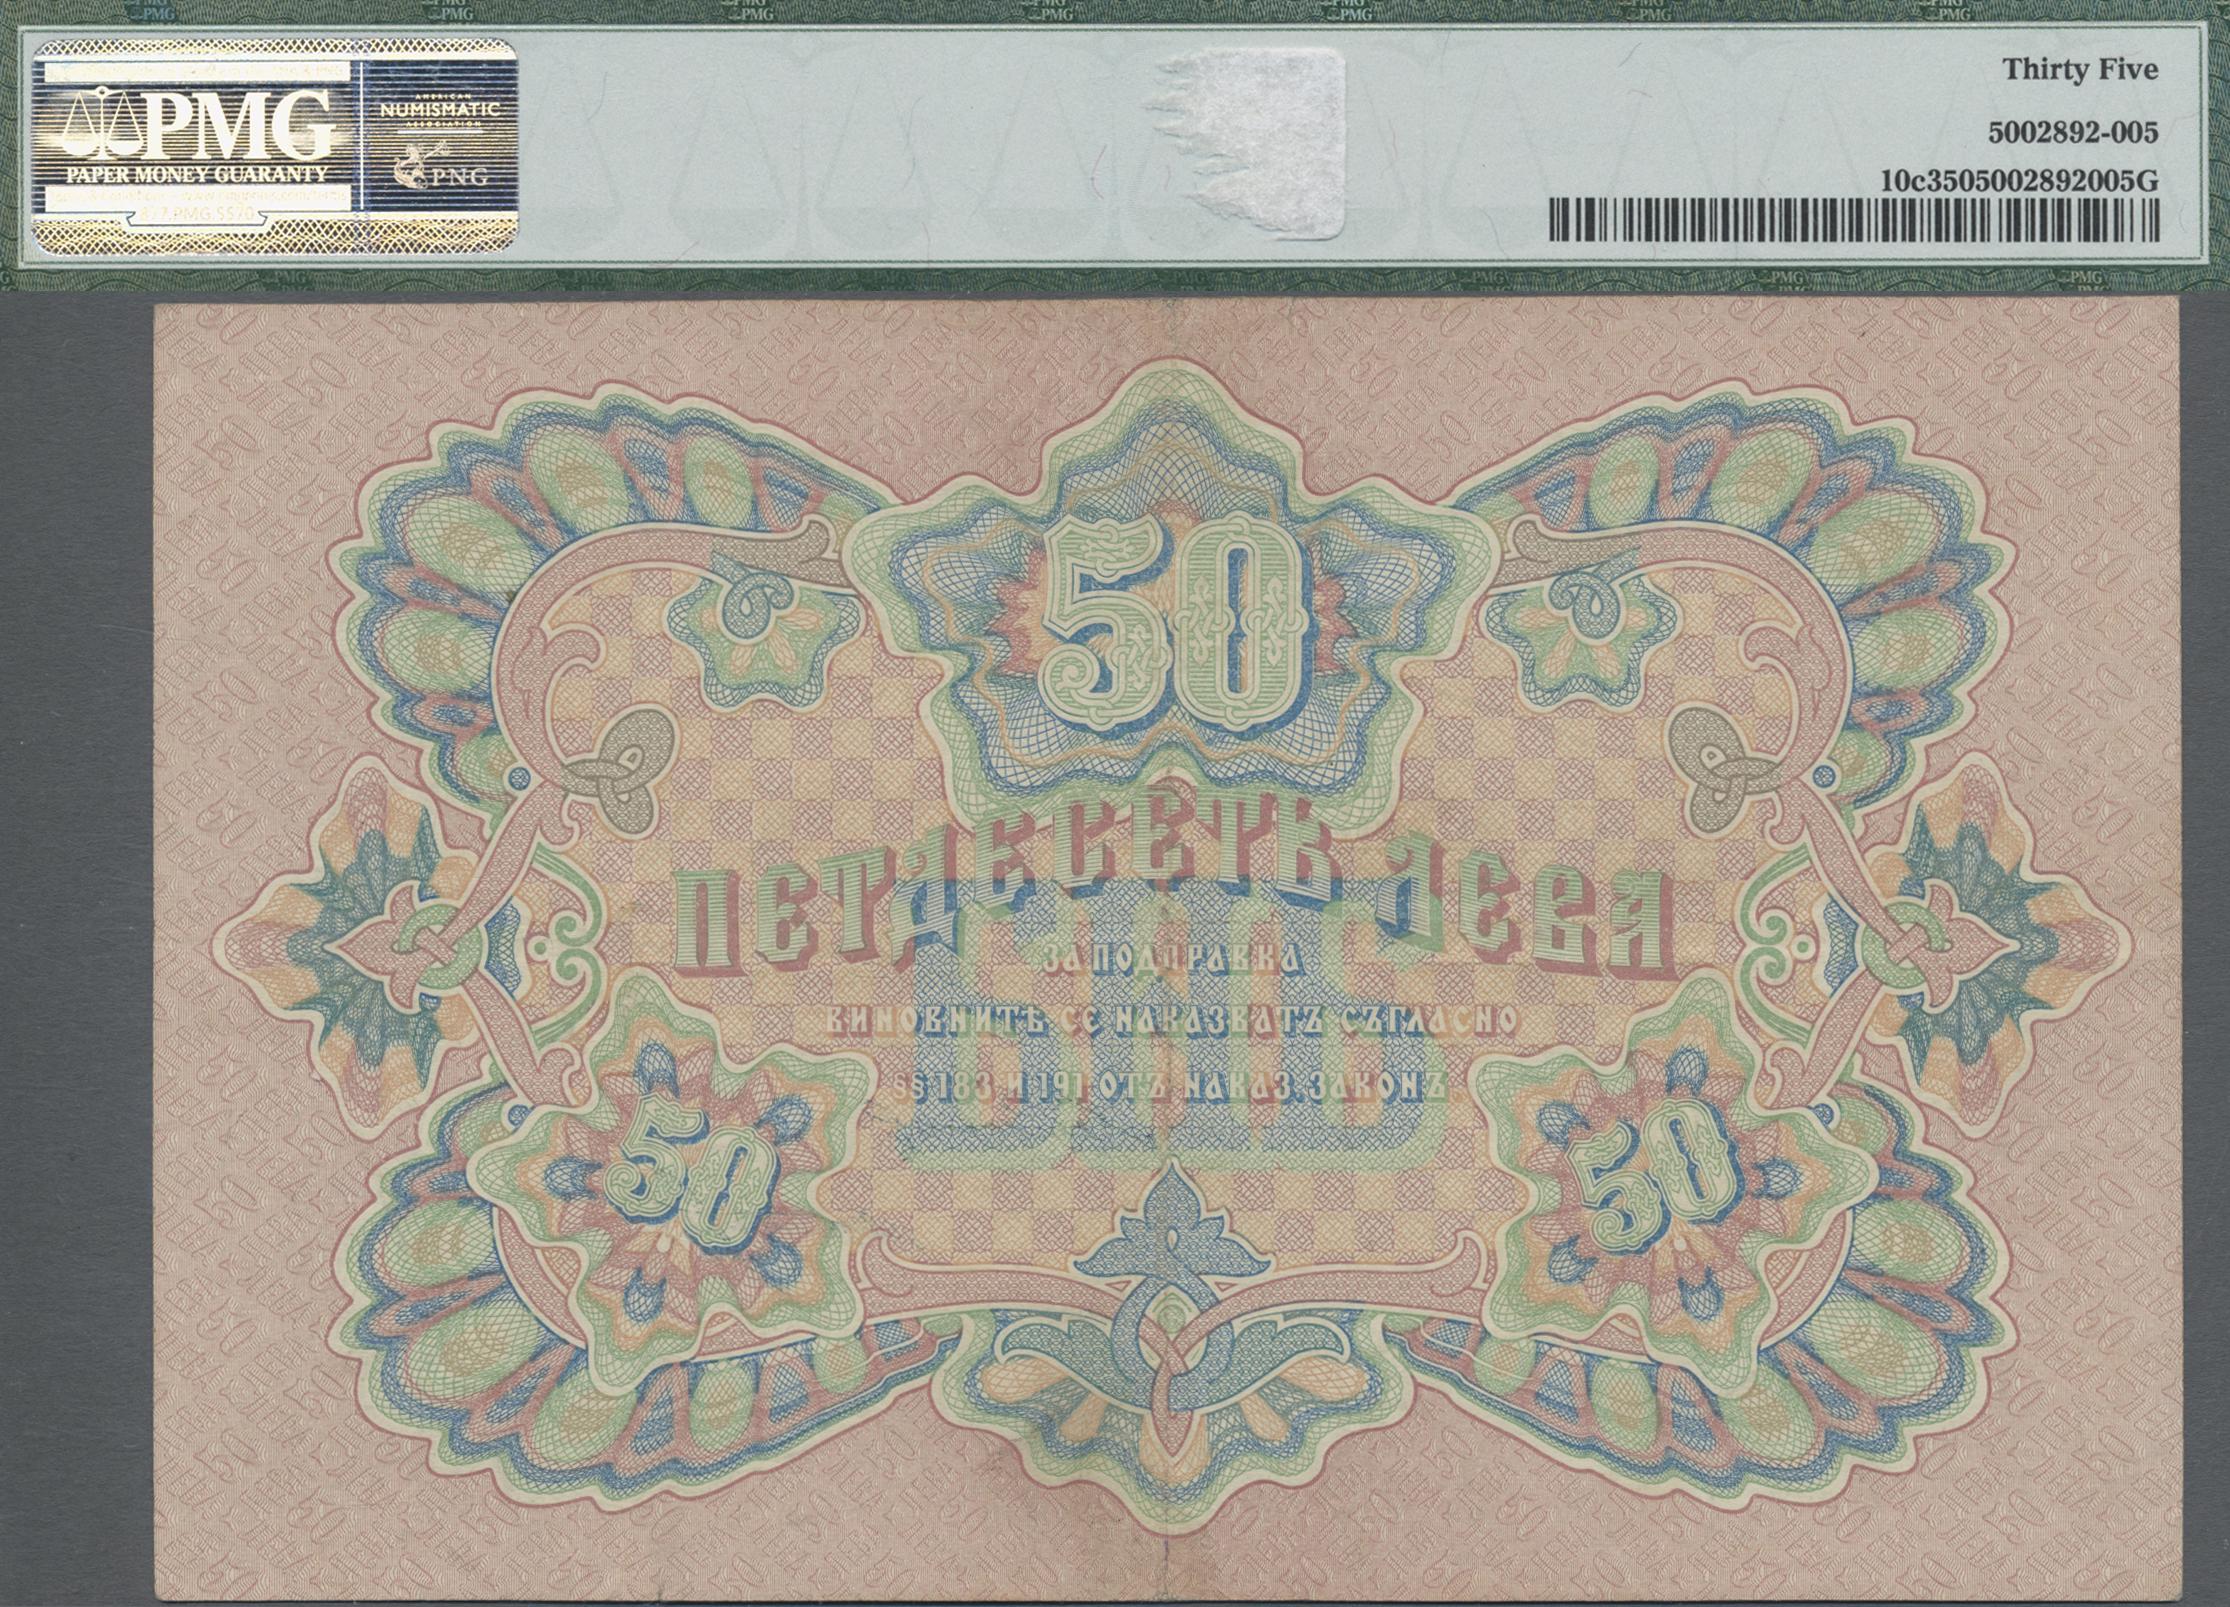 Lot 00208 - Bulgaria / Bulgarien   Banknoten  -  Auktionshaus Christoph Gärtner GmbH & Co. KG Sale #46 The Banknotes Worldwide section of the 46th Christoph Gärtner Auction